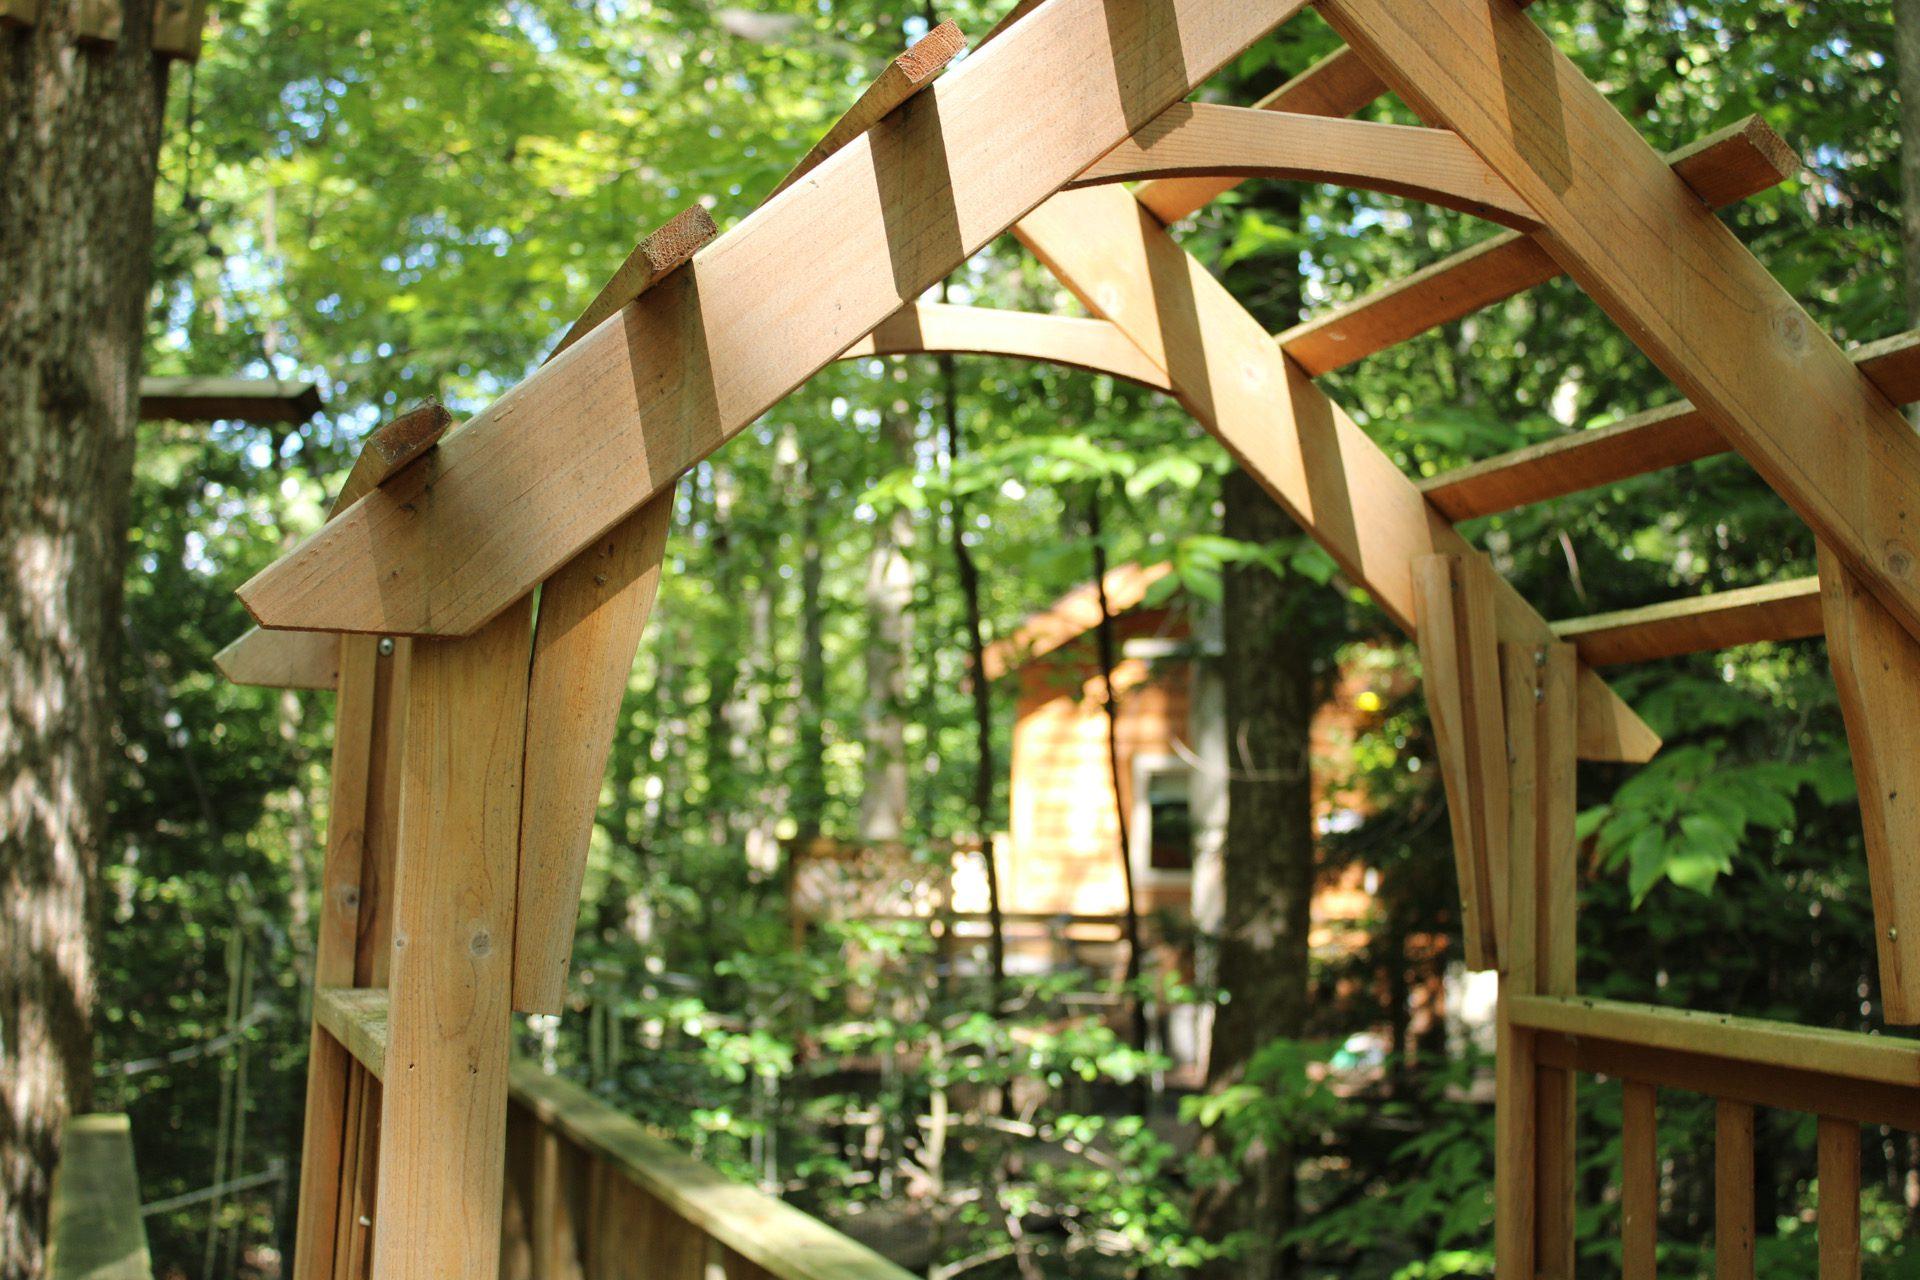 Tuscany Treehouse Archway and Bridge